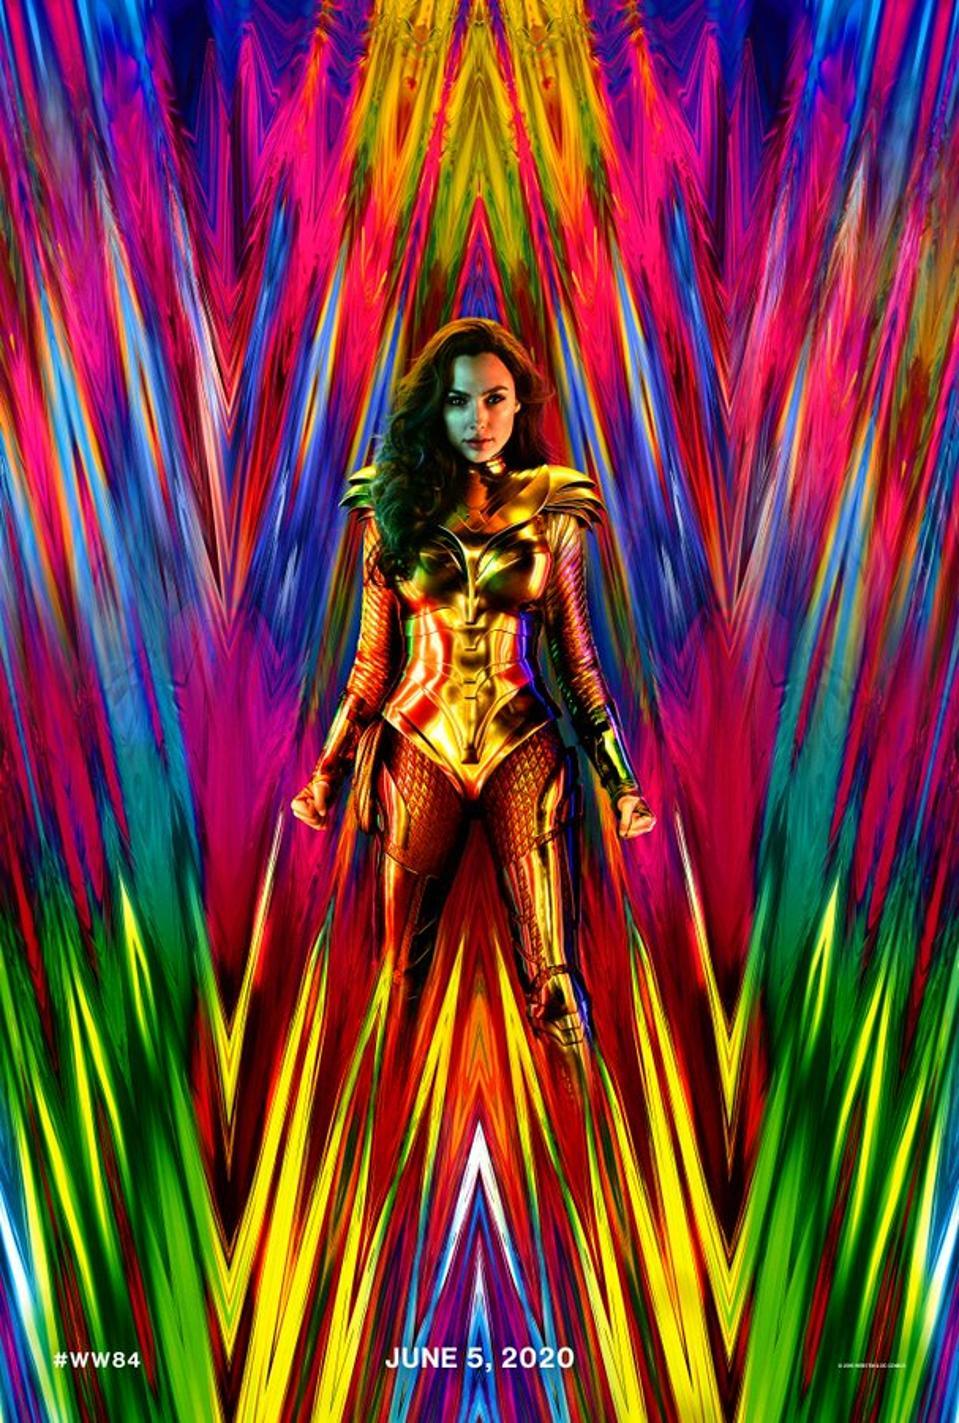 Official poster for Warner's ″Wonder Woman 1984.″